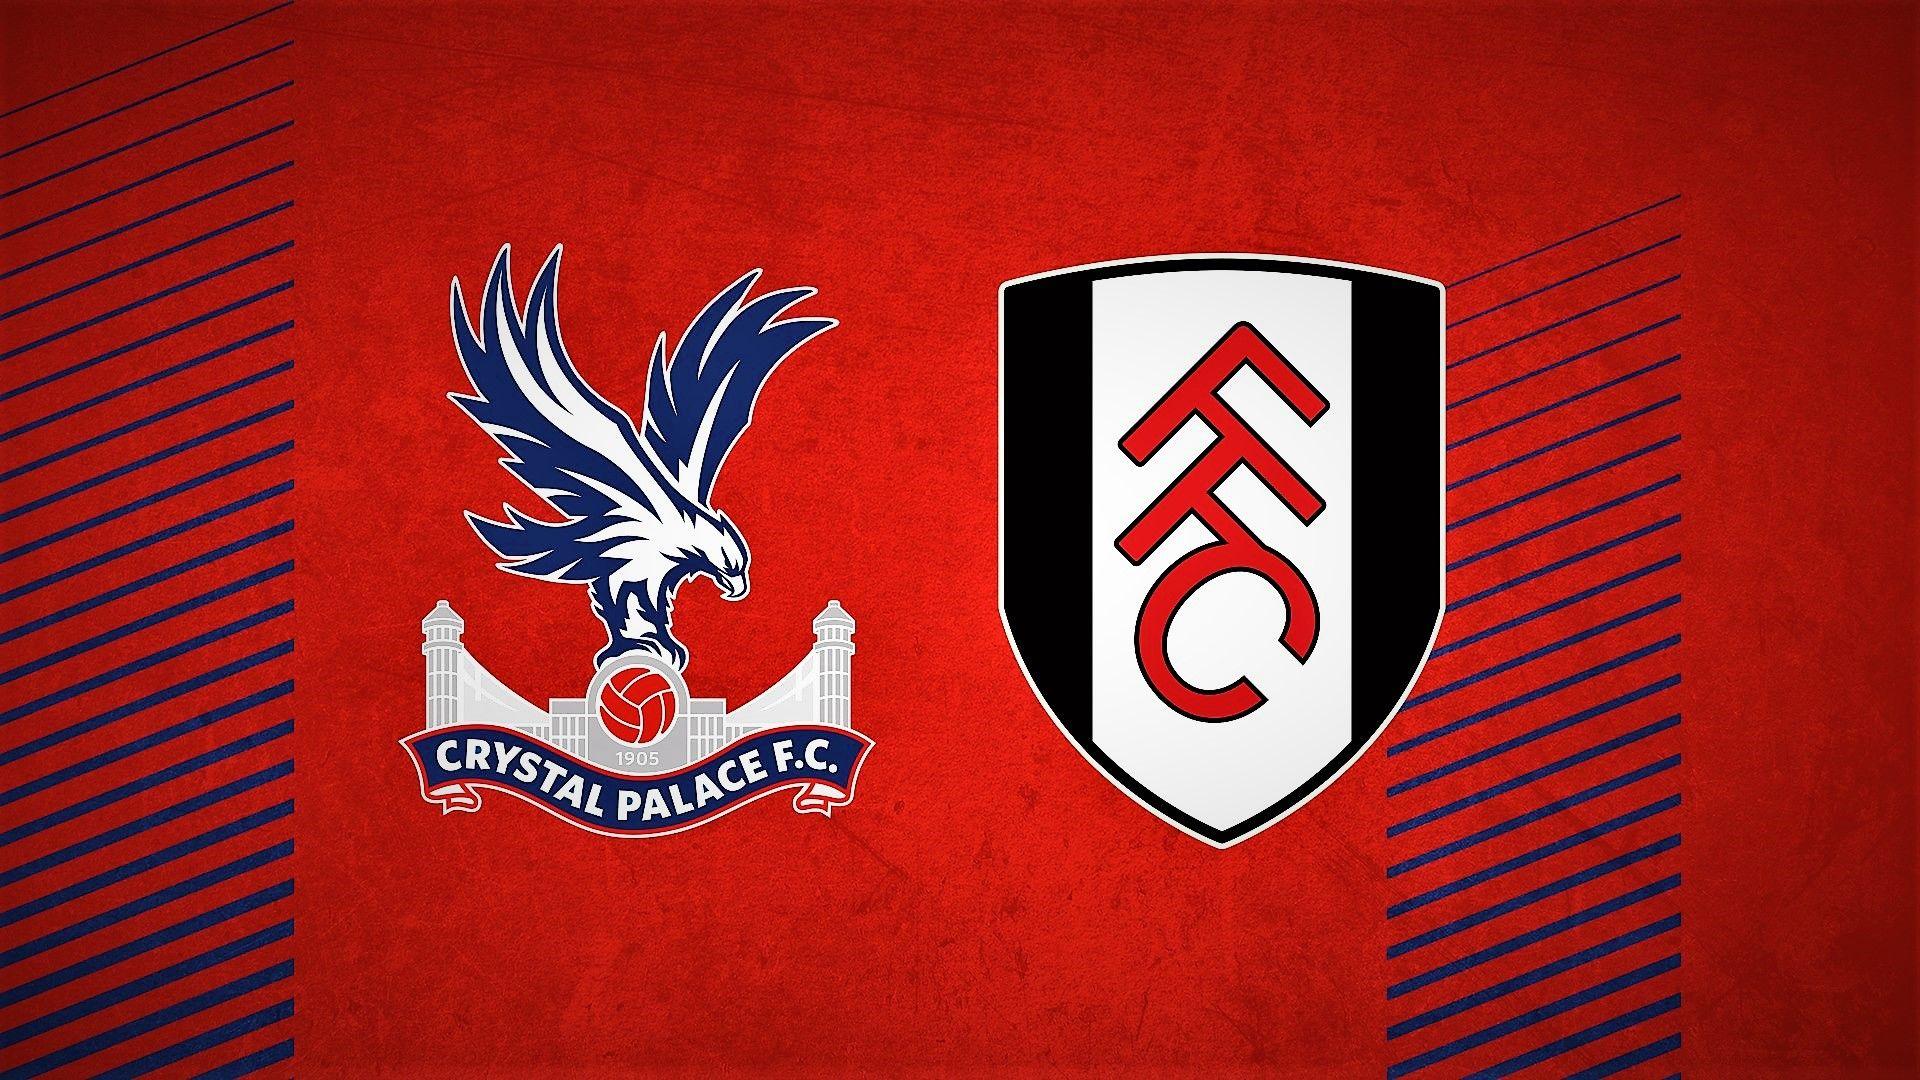 Huddersfield Town Vs Leicester City Preview Premier League 2018 19 Live Stream Team News Betting Tv Live Score Crystal Palace Premier League Fulham